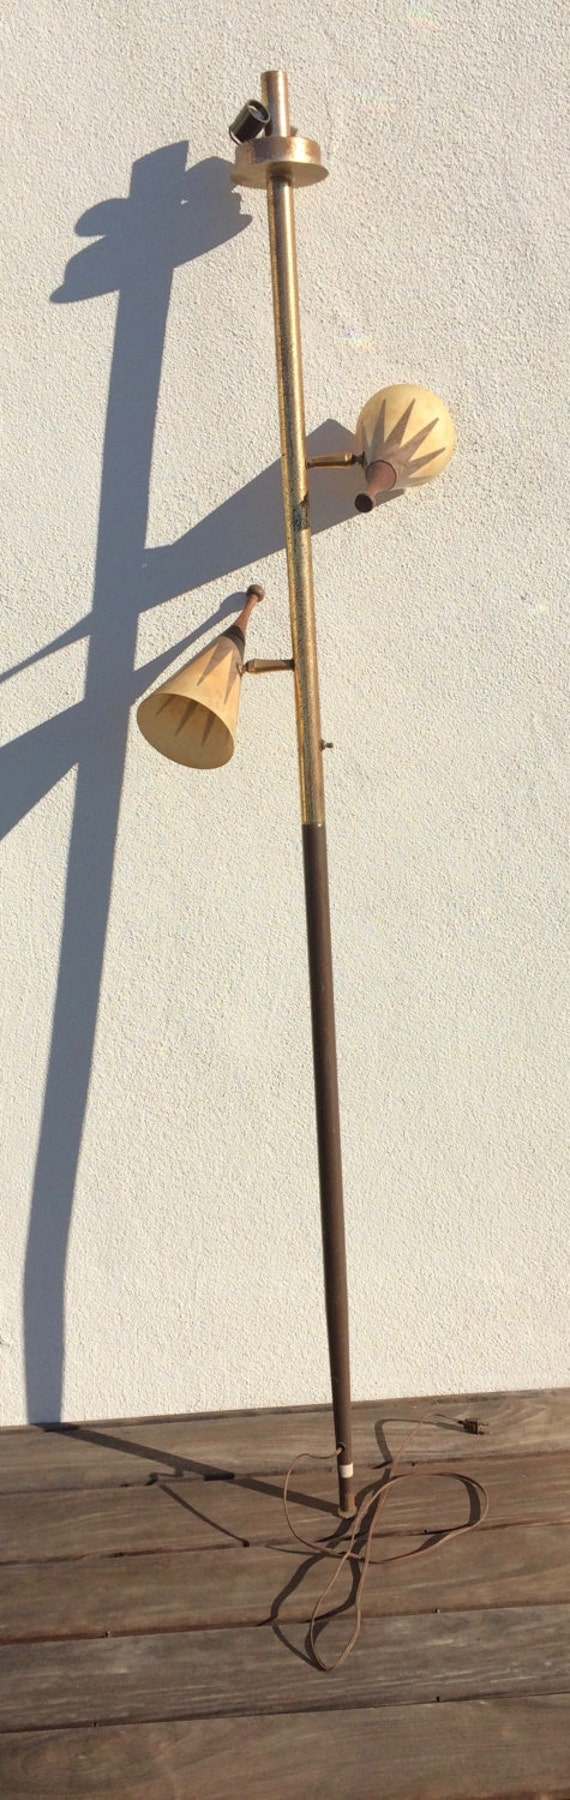 Mid Century Modern Lamp Shades Salvaged Lamp Pole Two Retro